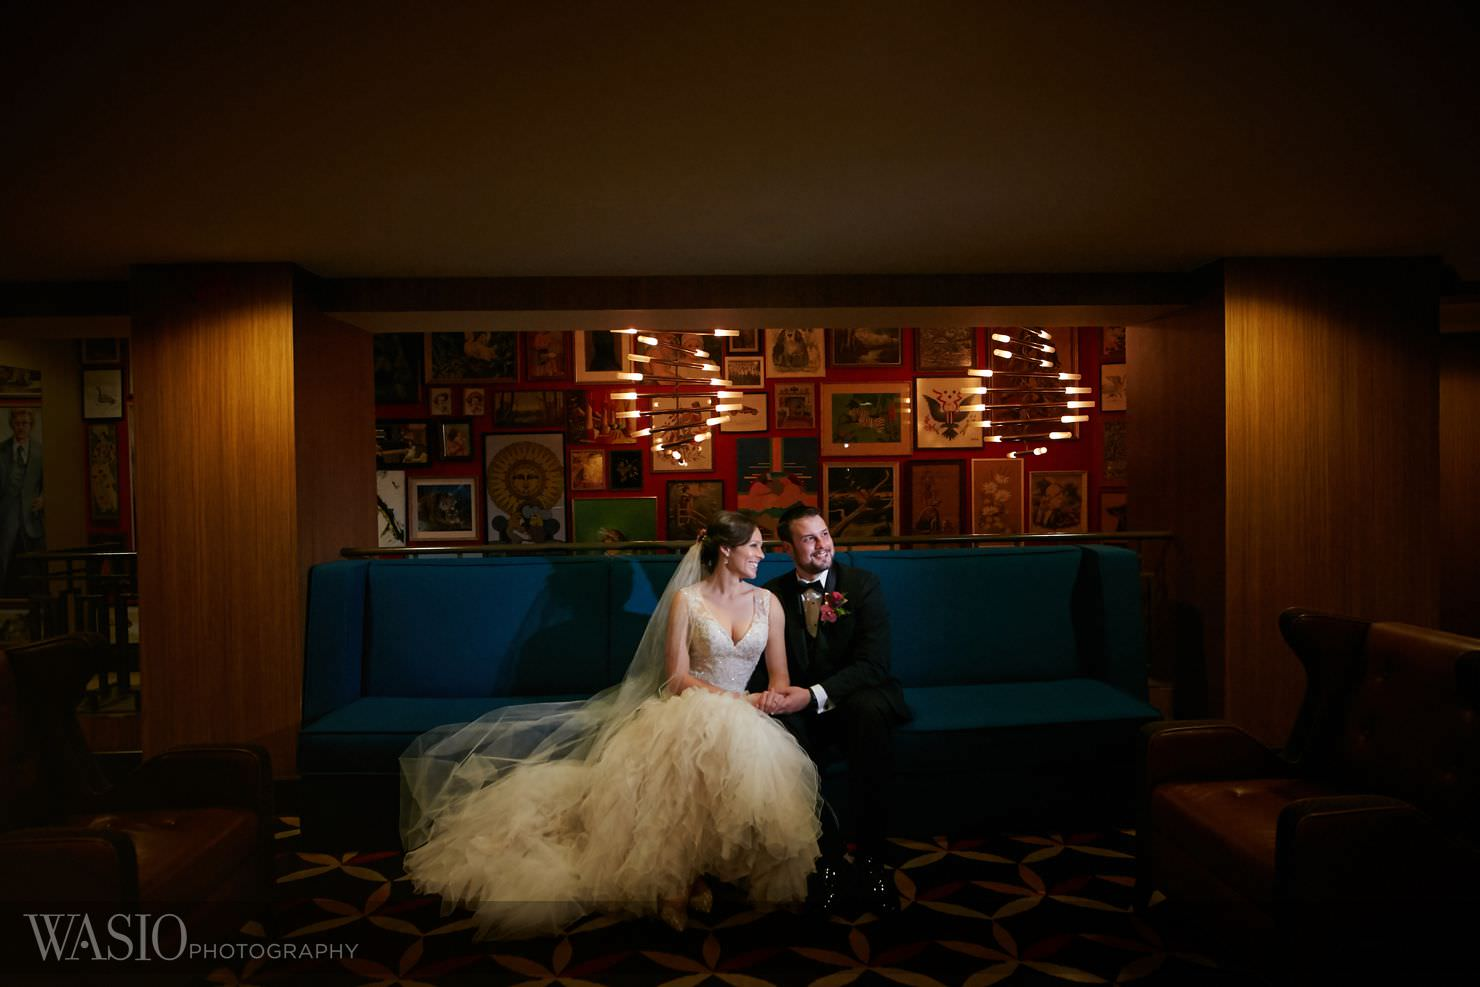 014_Lincoln-Park-Wedding_Dimphy-Mark__O3A9492 Lincoln Park Wedding - Dimphy & Mark